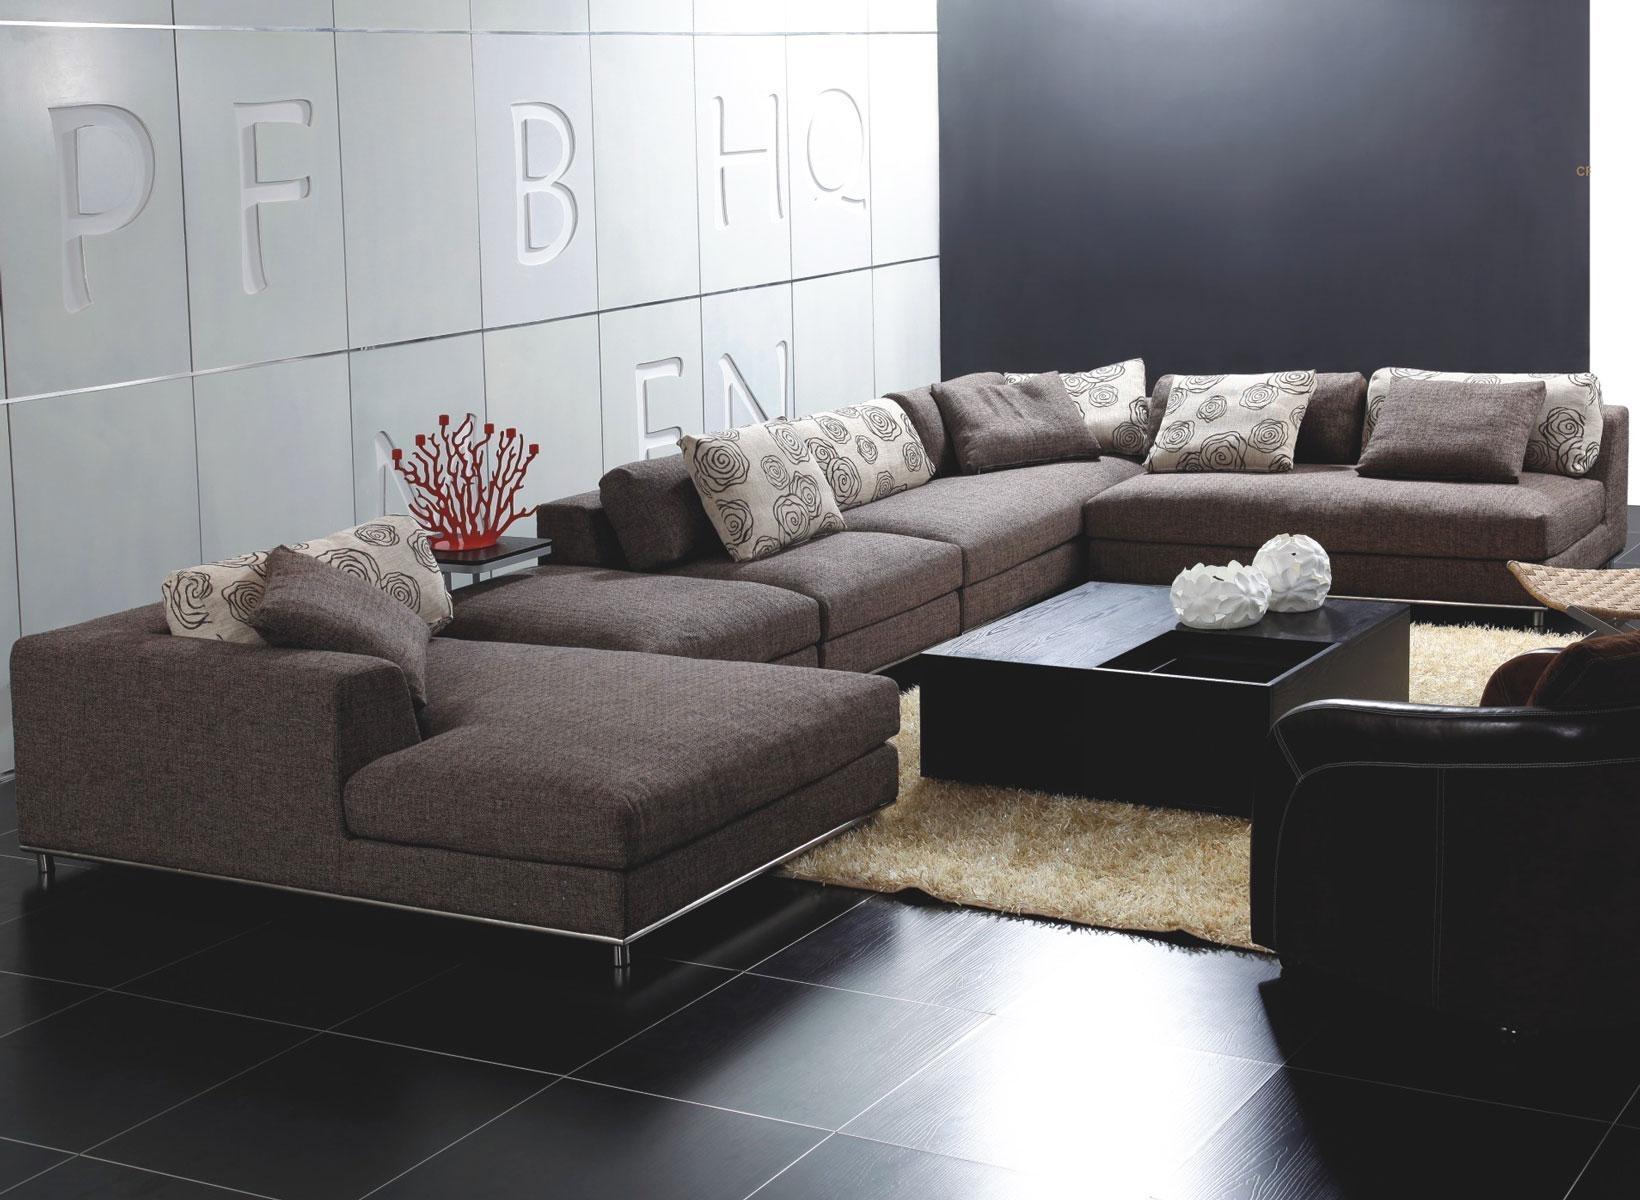 Furniture : Kijiji Used Sofa Bed Toronto Leather Sofa Kijiji Gta With Gta Sectional Sofas (View 8 of 10)